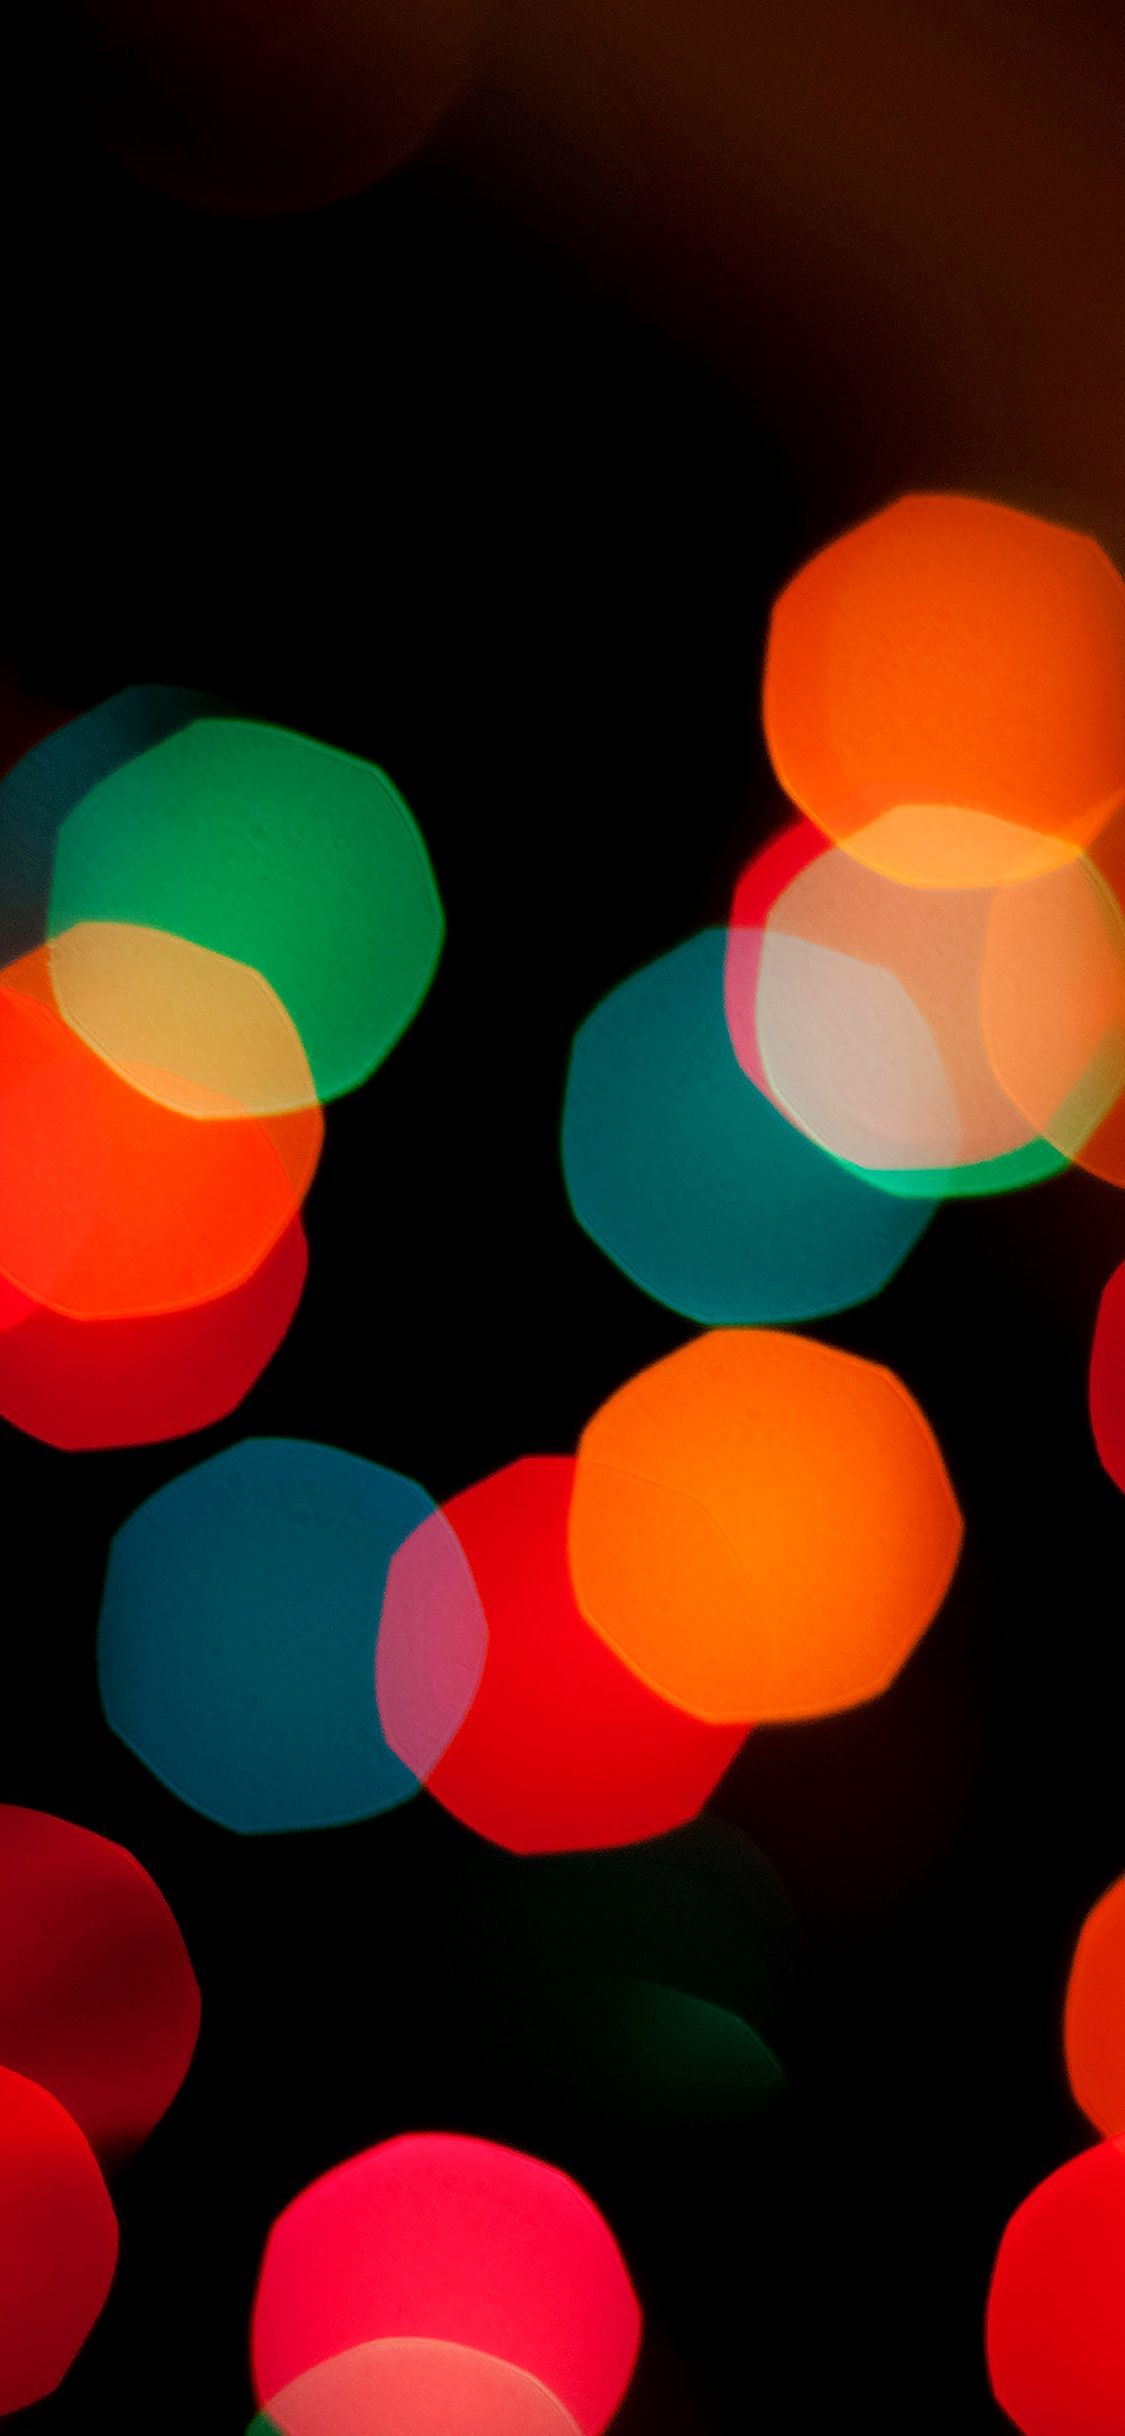 Ios 12 Wallpaper 4k Iphone X Ideas Wallpaper 4kwallpaper 4kwallpaperphone 4kchristmaswallpa Wallpaper Iphone Christmas Christmas Wallpaper Apple Picture